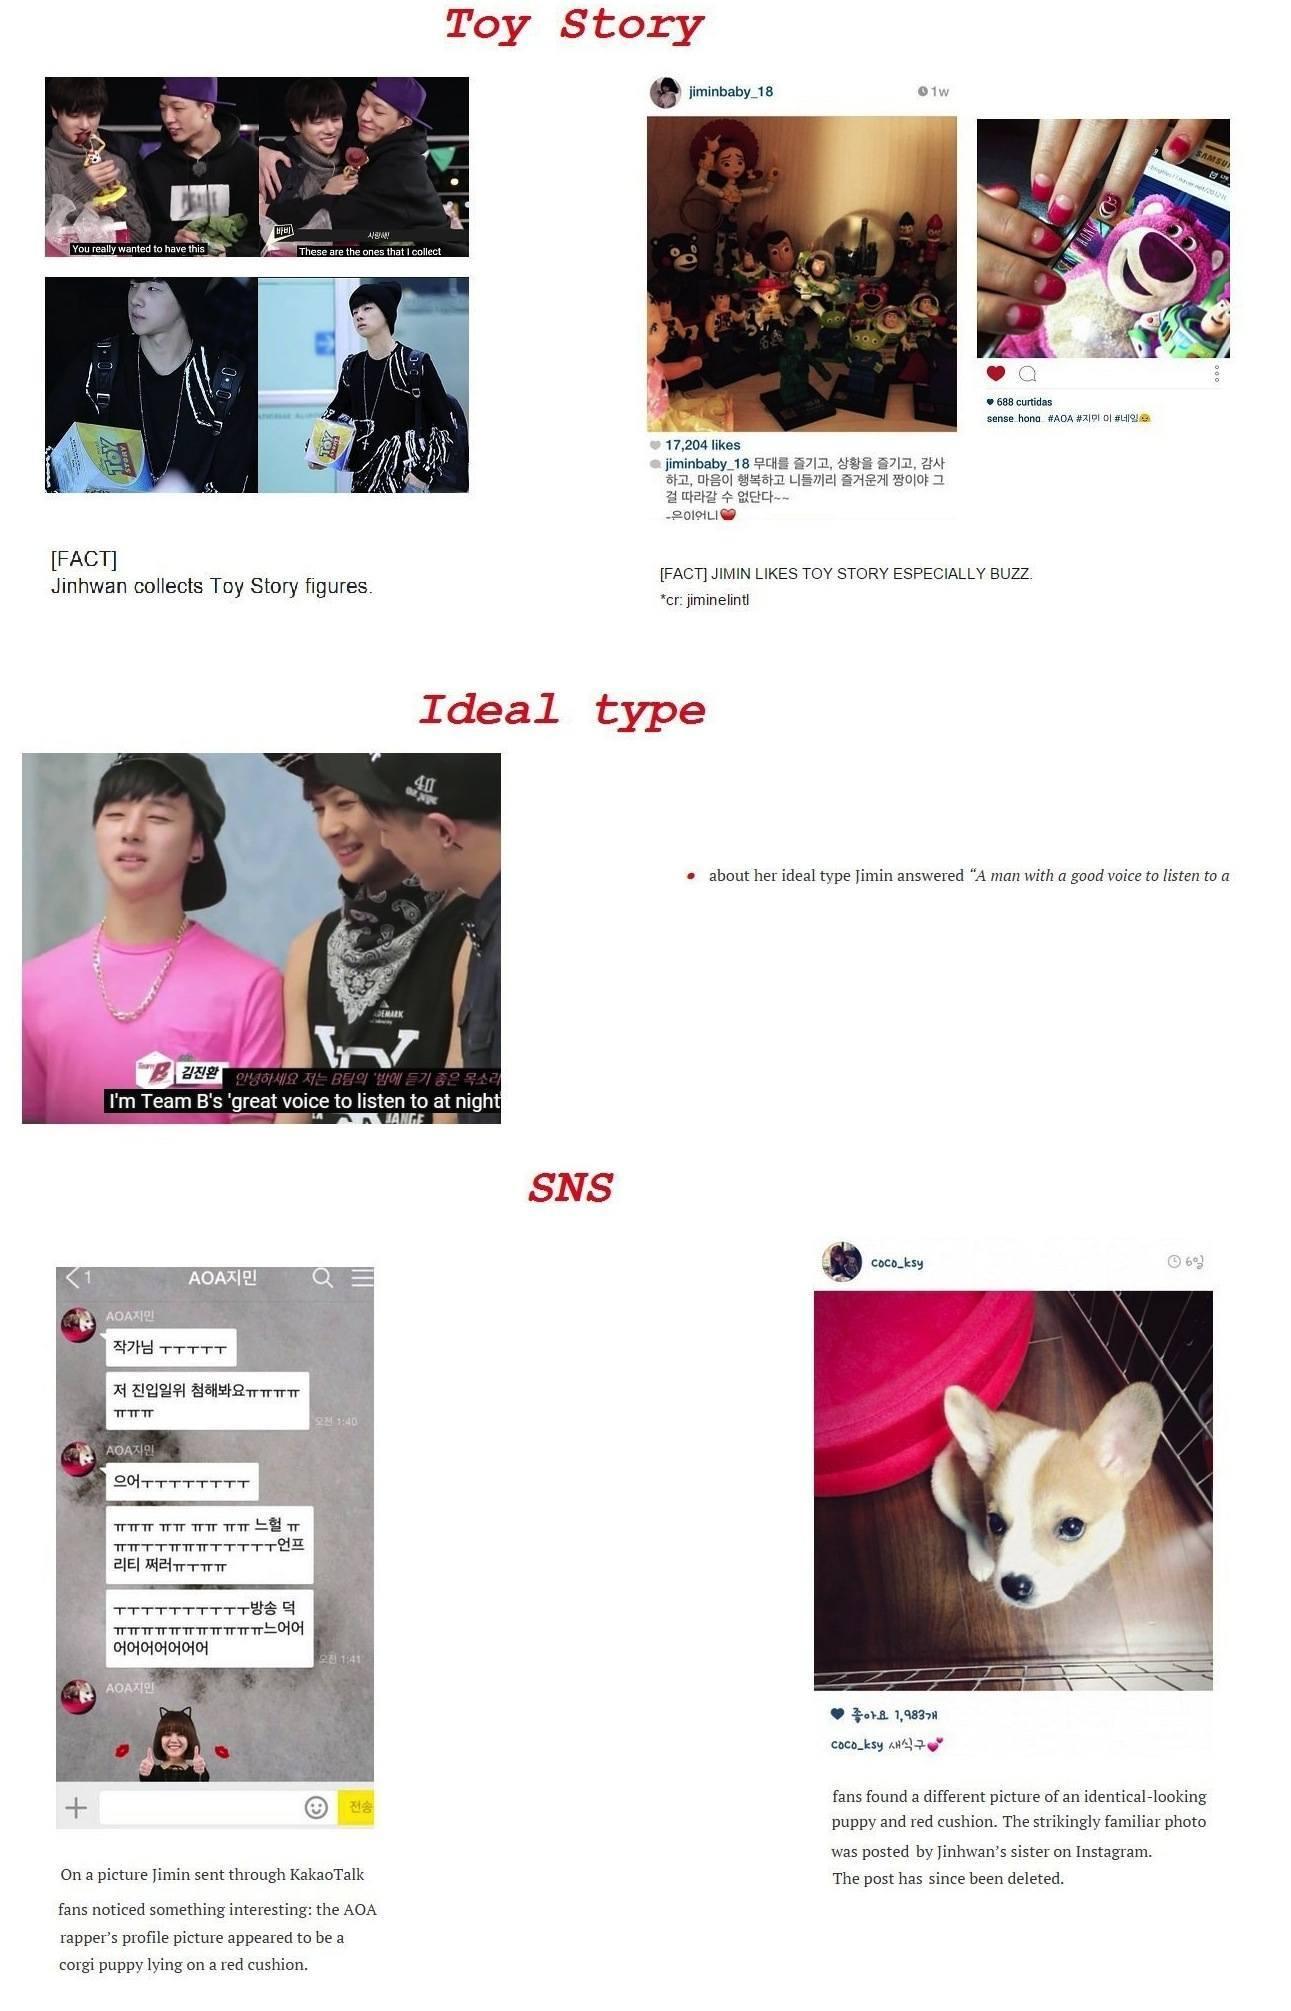 R vorkuta dating. dating site. Jimin aoa y jinhwan ikon sitio.